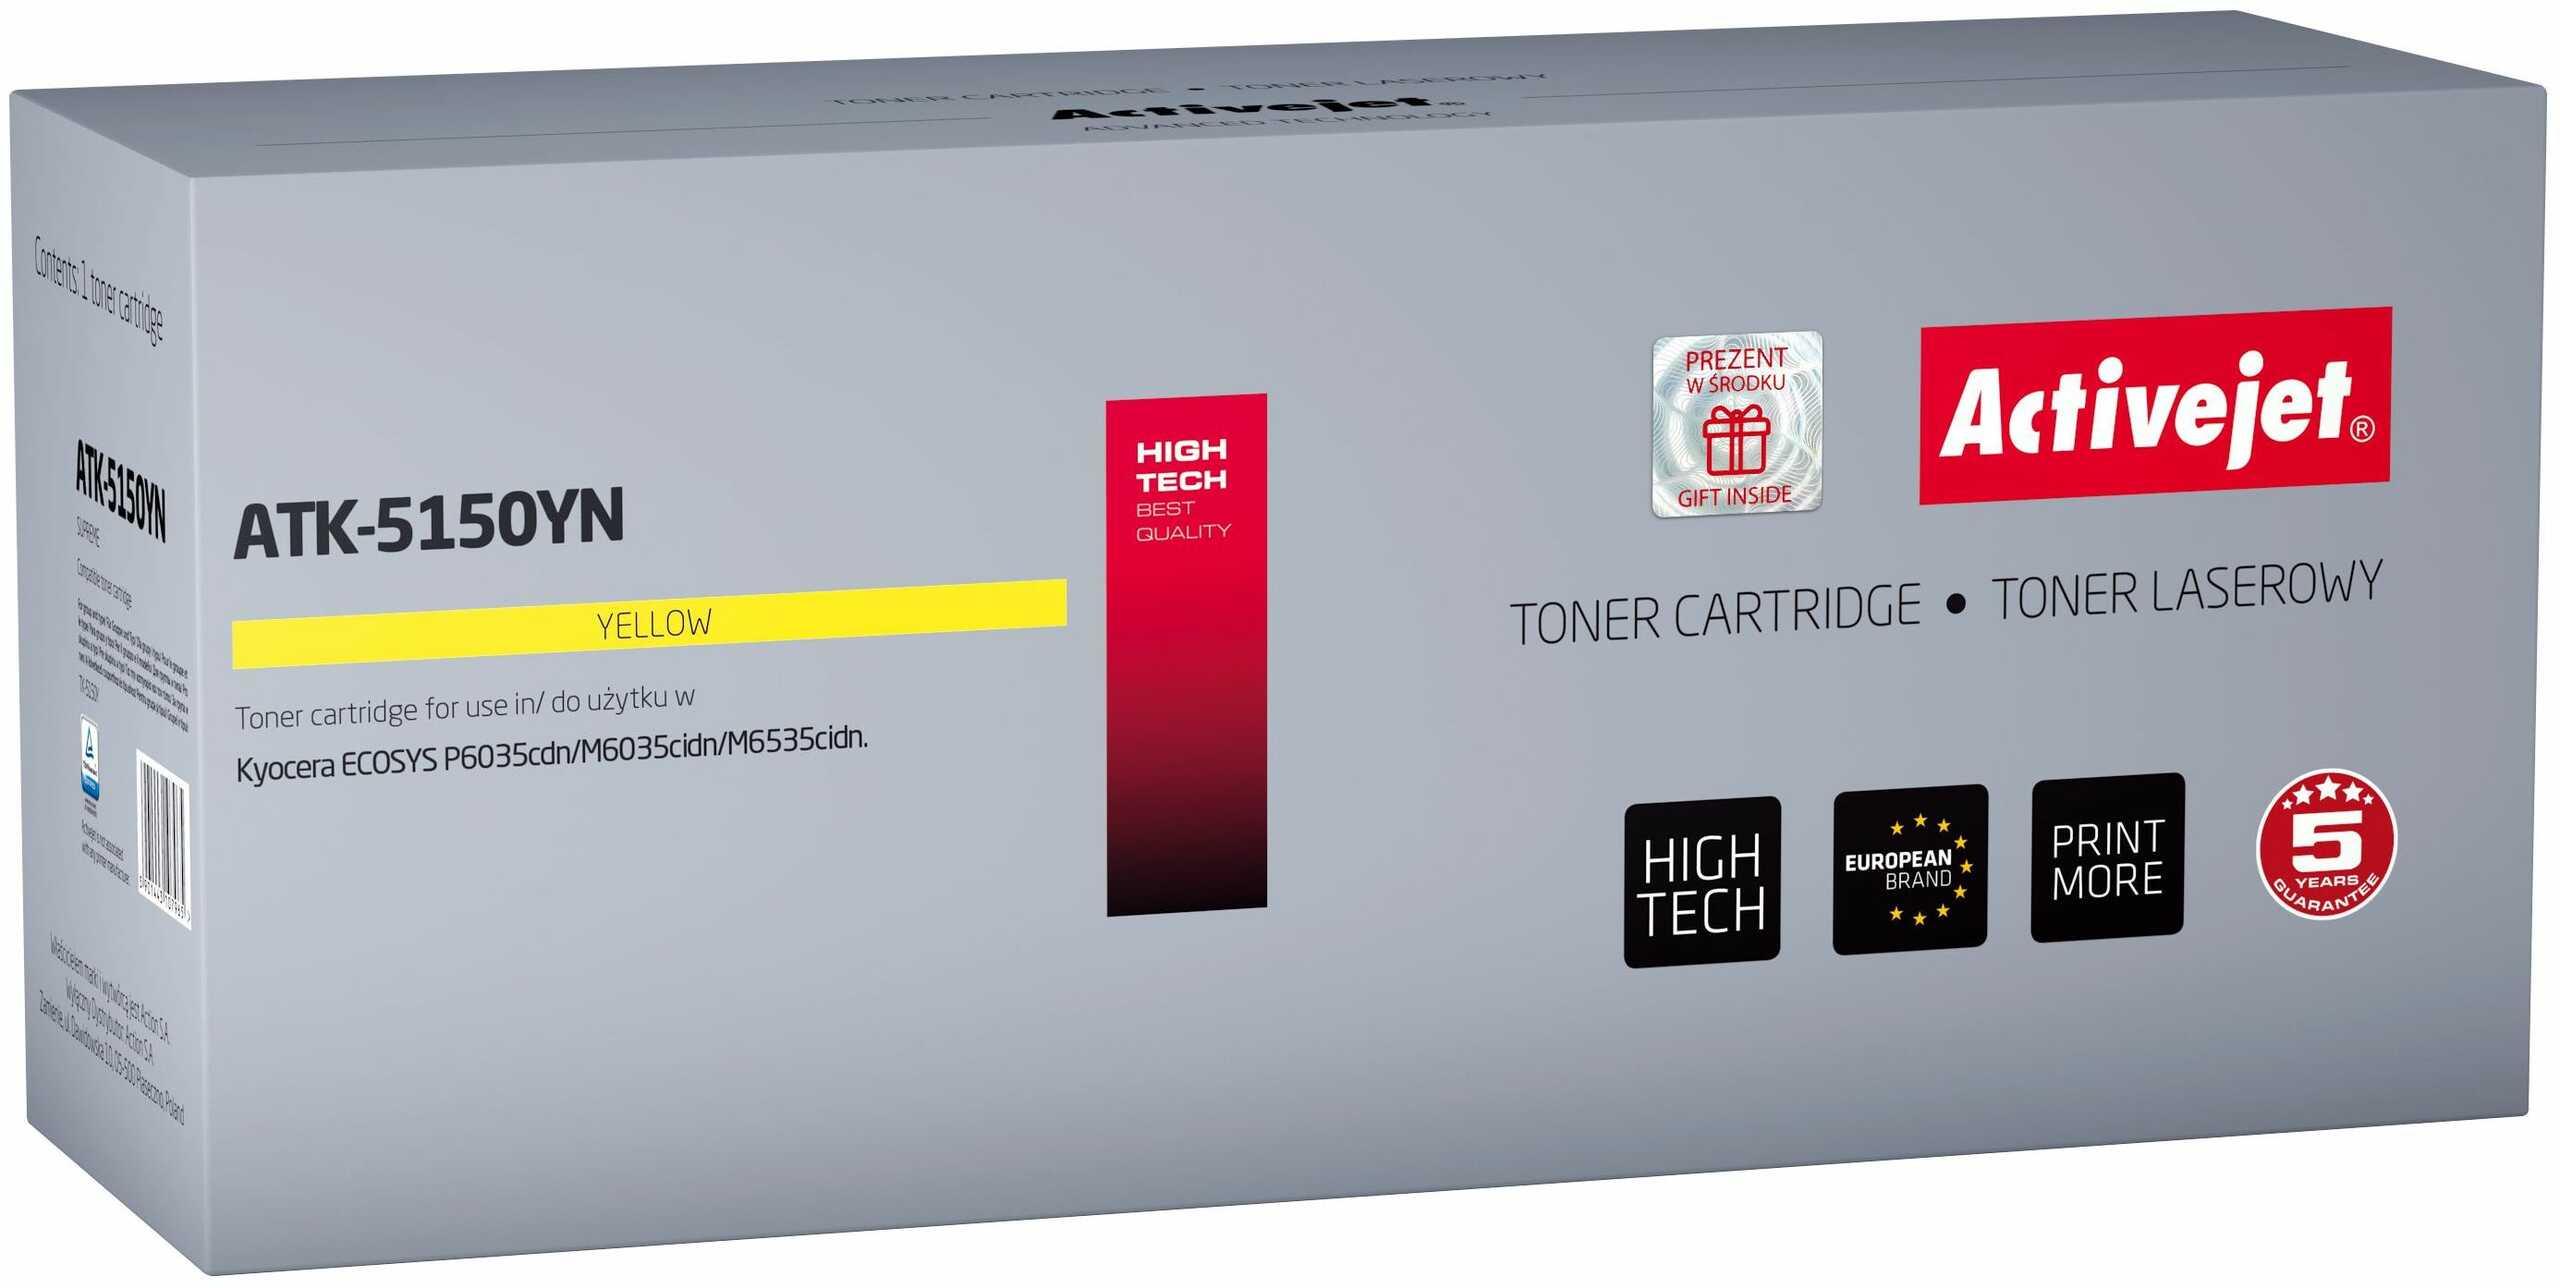 Toner Activejet ATK-5150YN (zamiennik Kyocera TK-5150Y; Supreme; 10 000 stron; żółty)